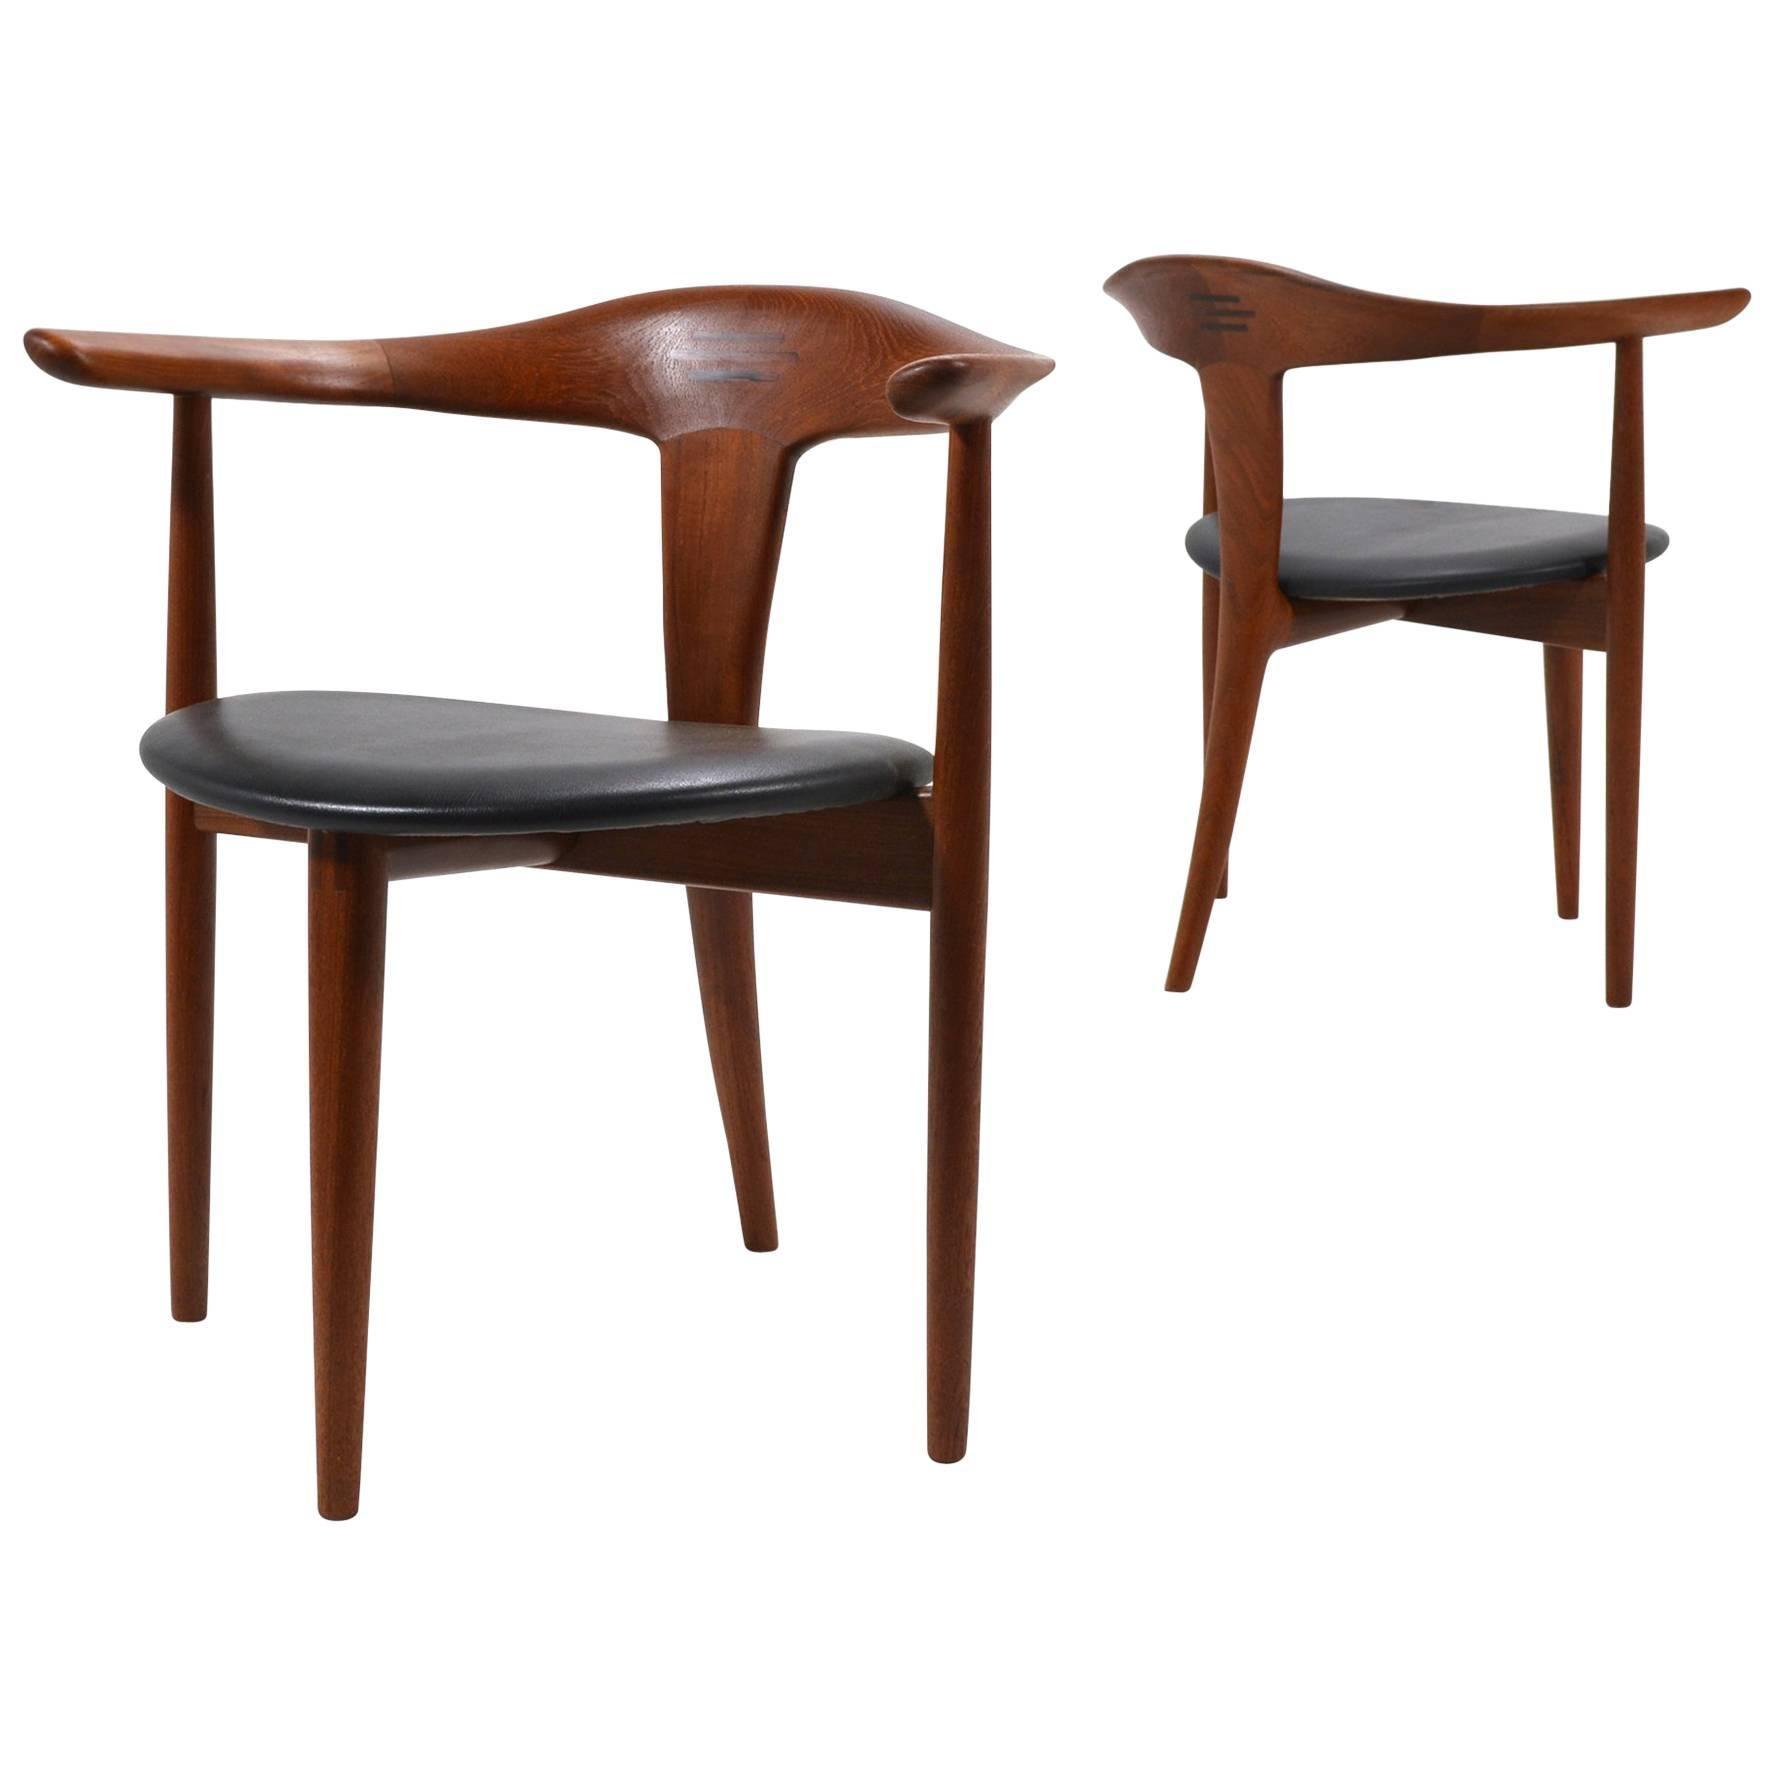 Erik Andersen and Palle Pedersen Pair of Rare Easy Chairs